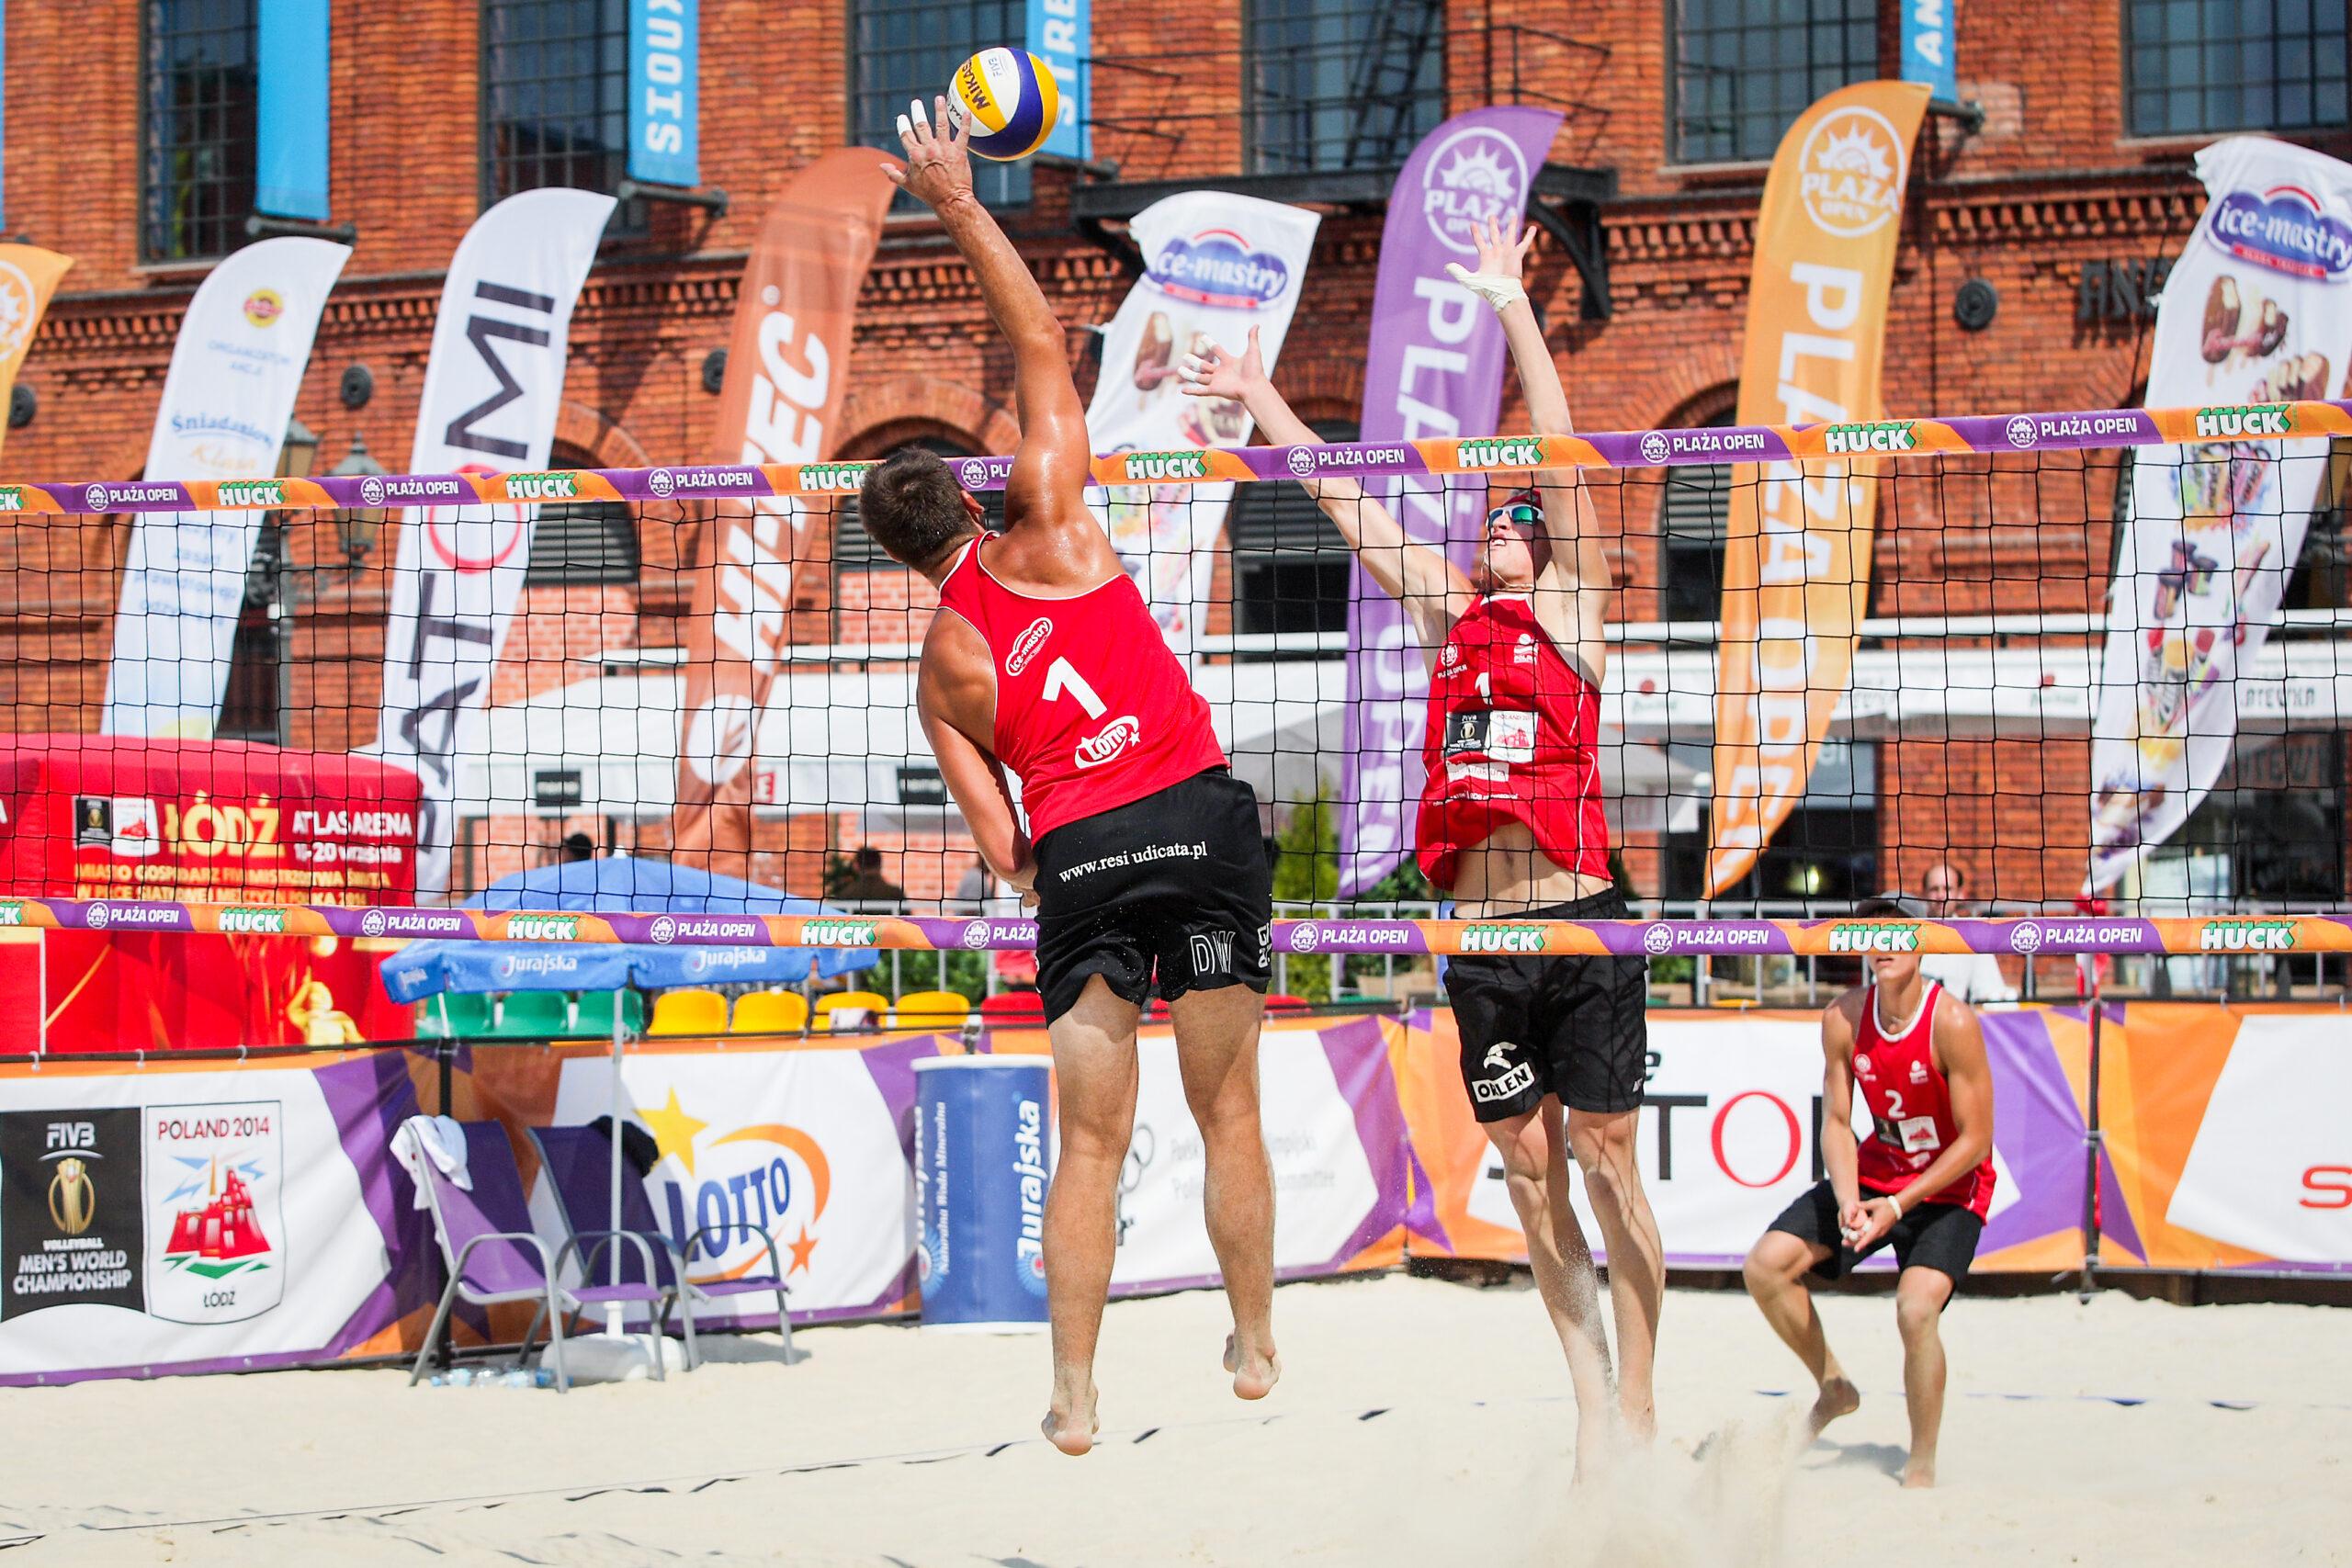 Plaża Open 2014 Łódź